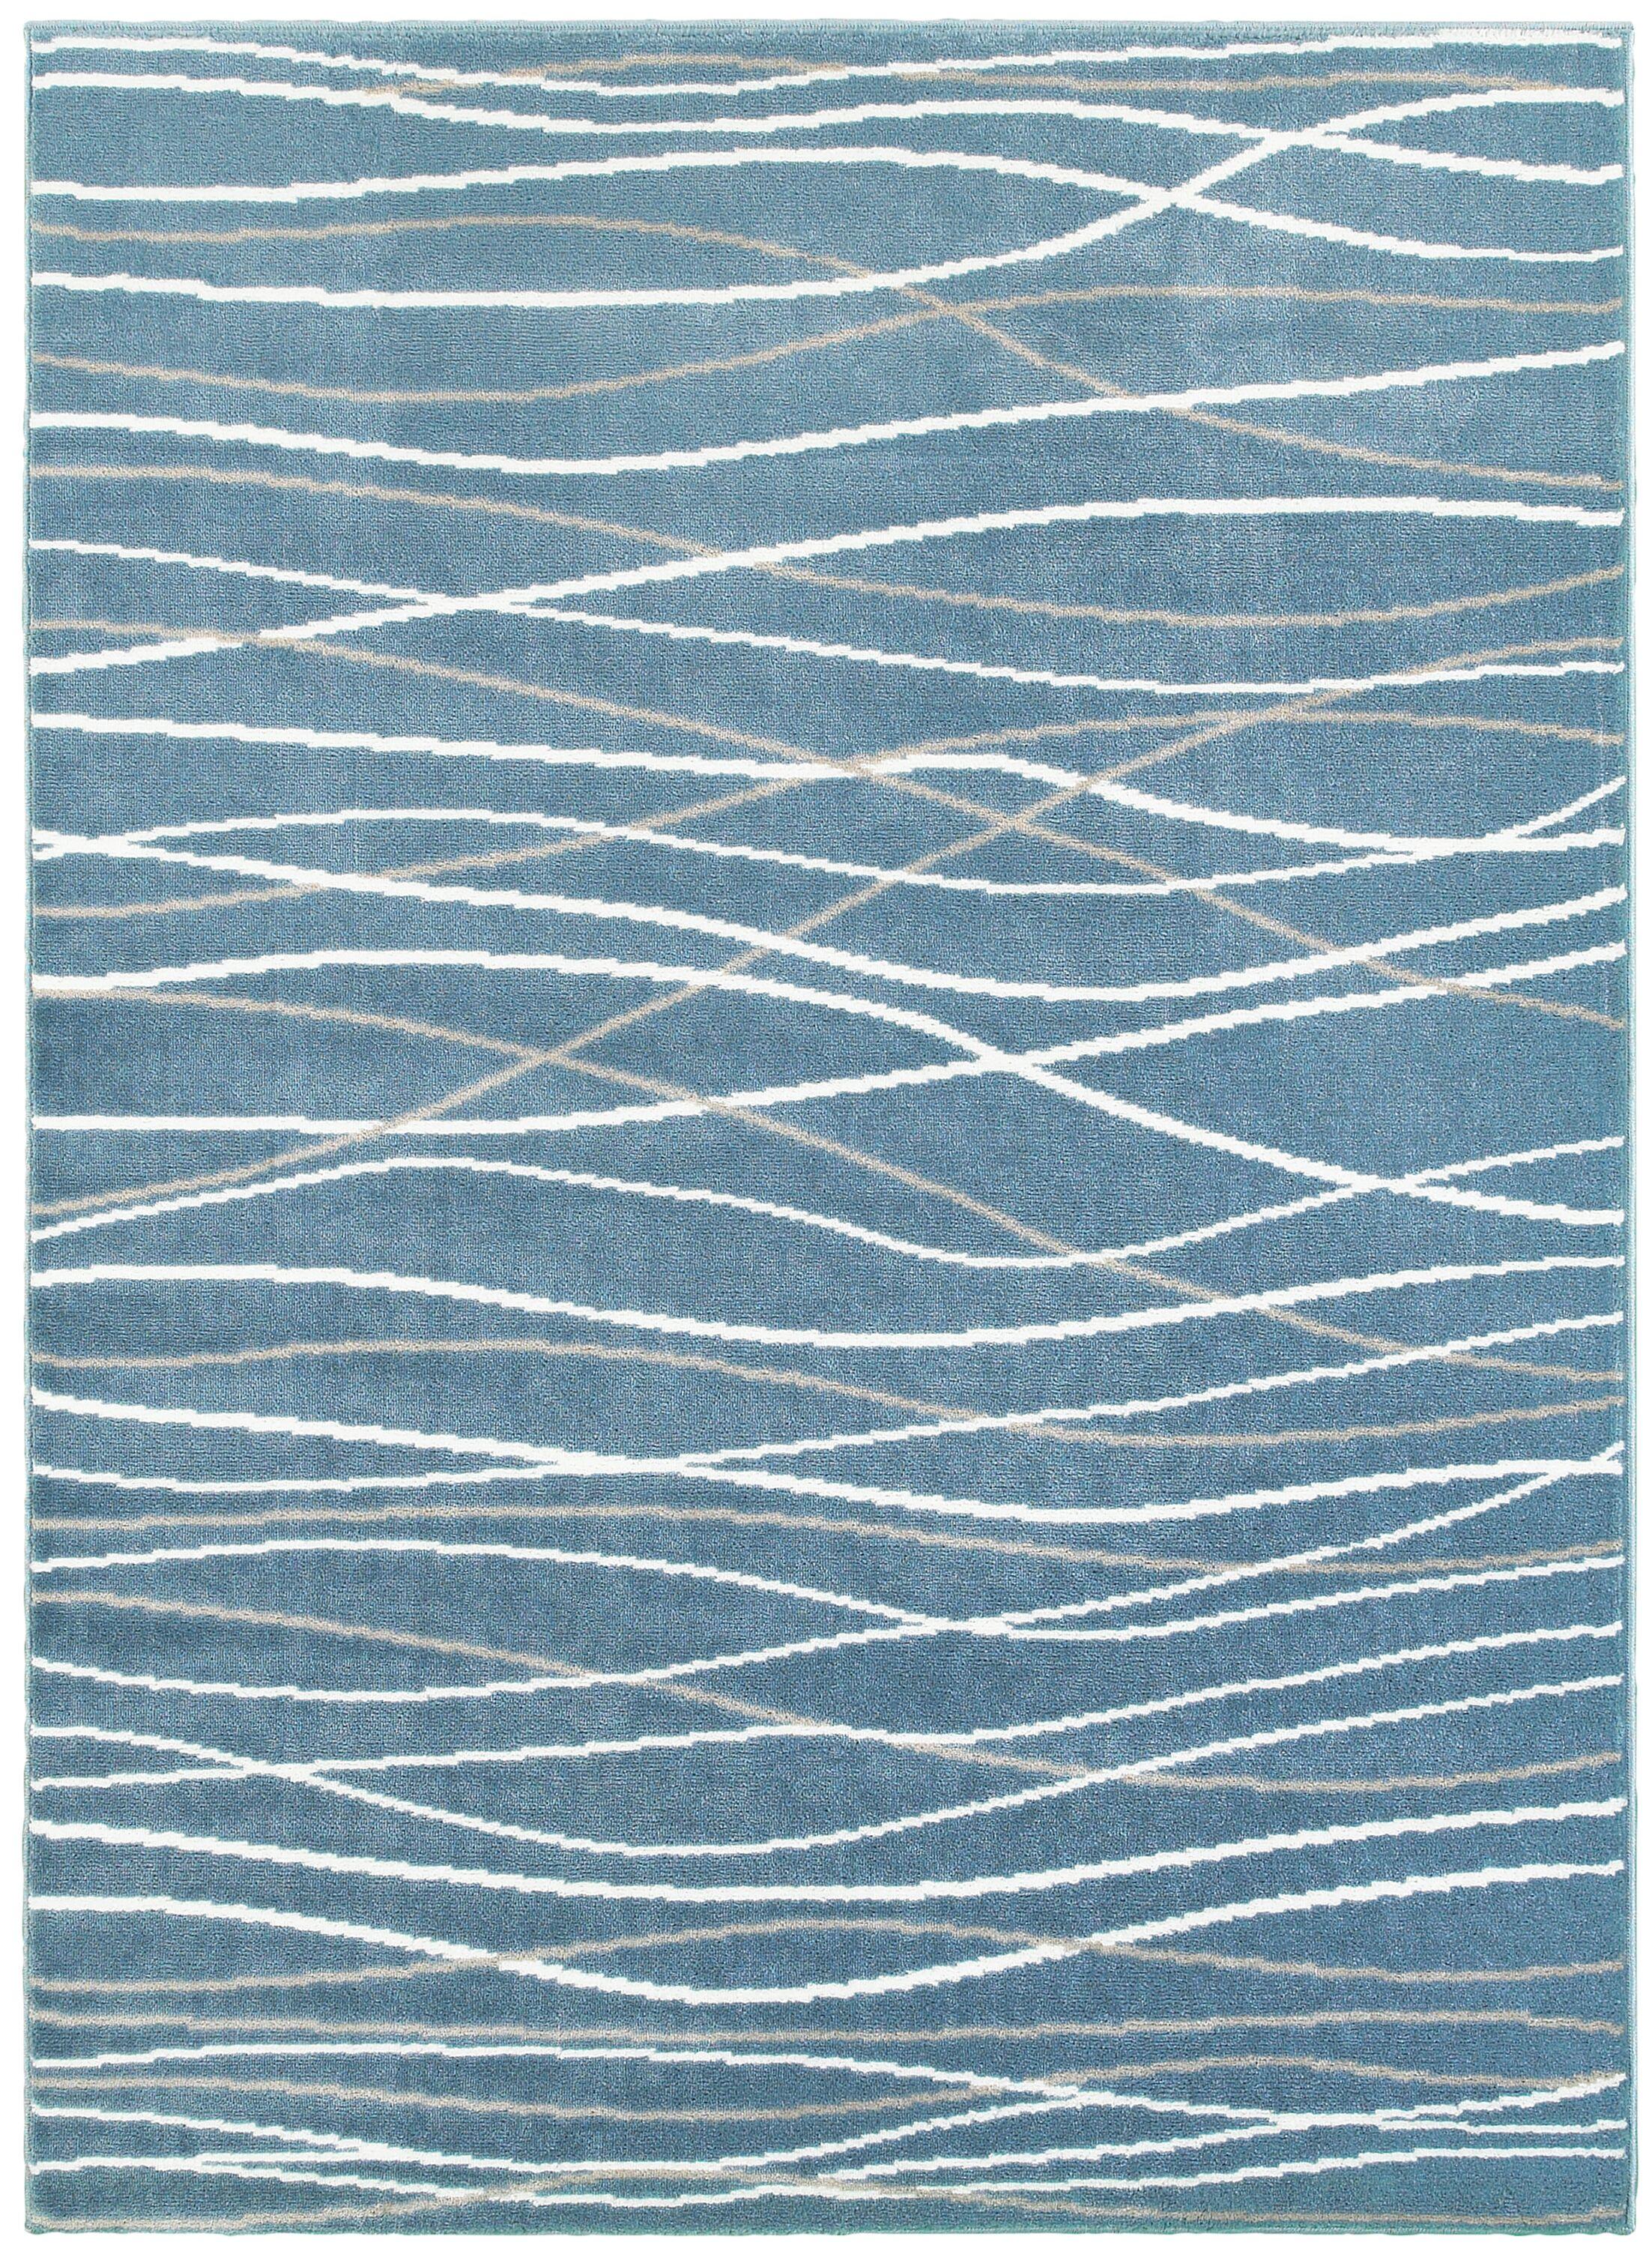 Ky Grace Teal Blue/Beige/White Area Rug Rug Size: 9' x 12'